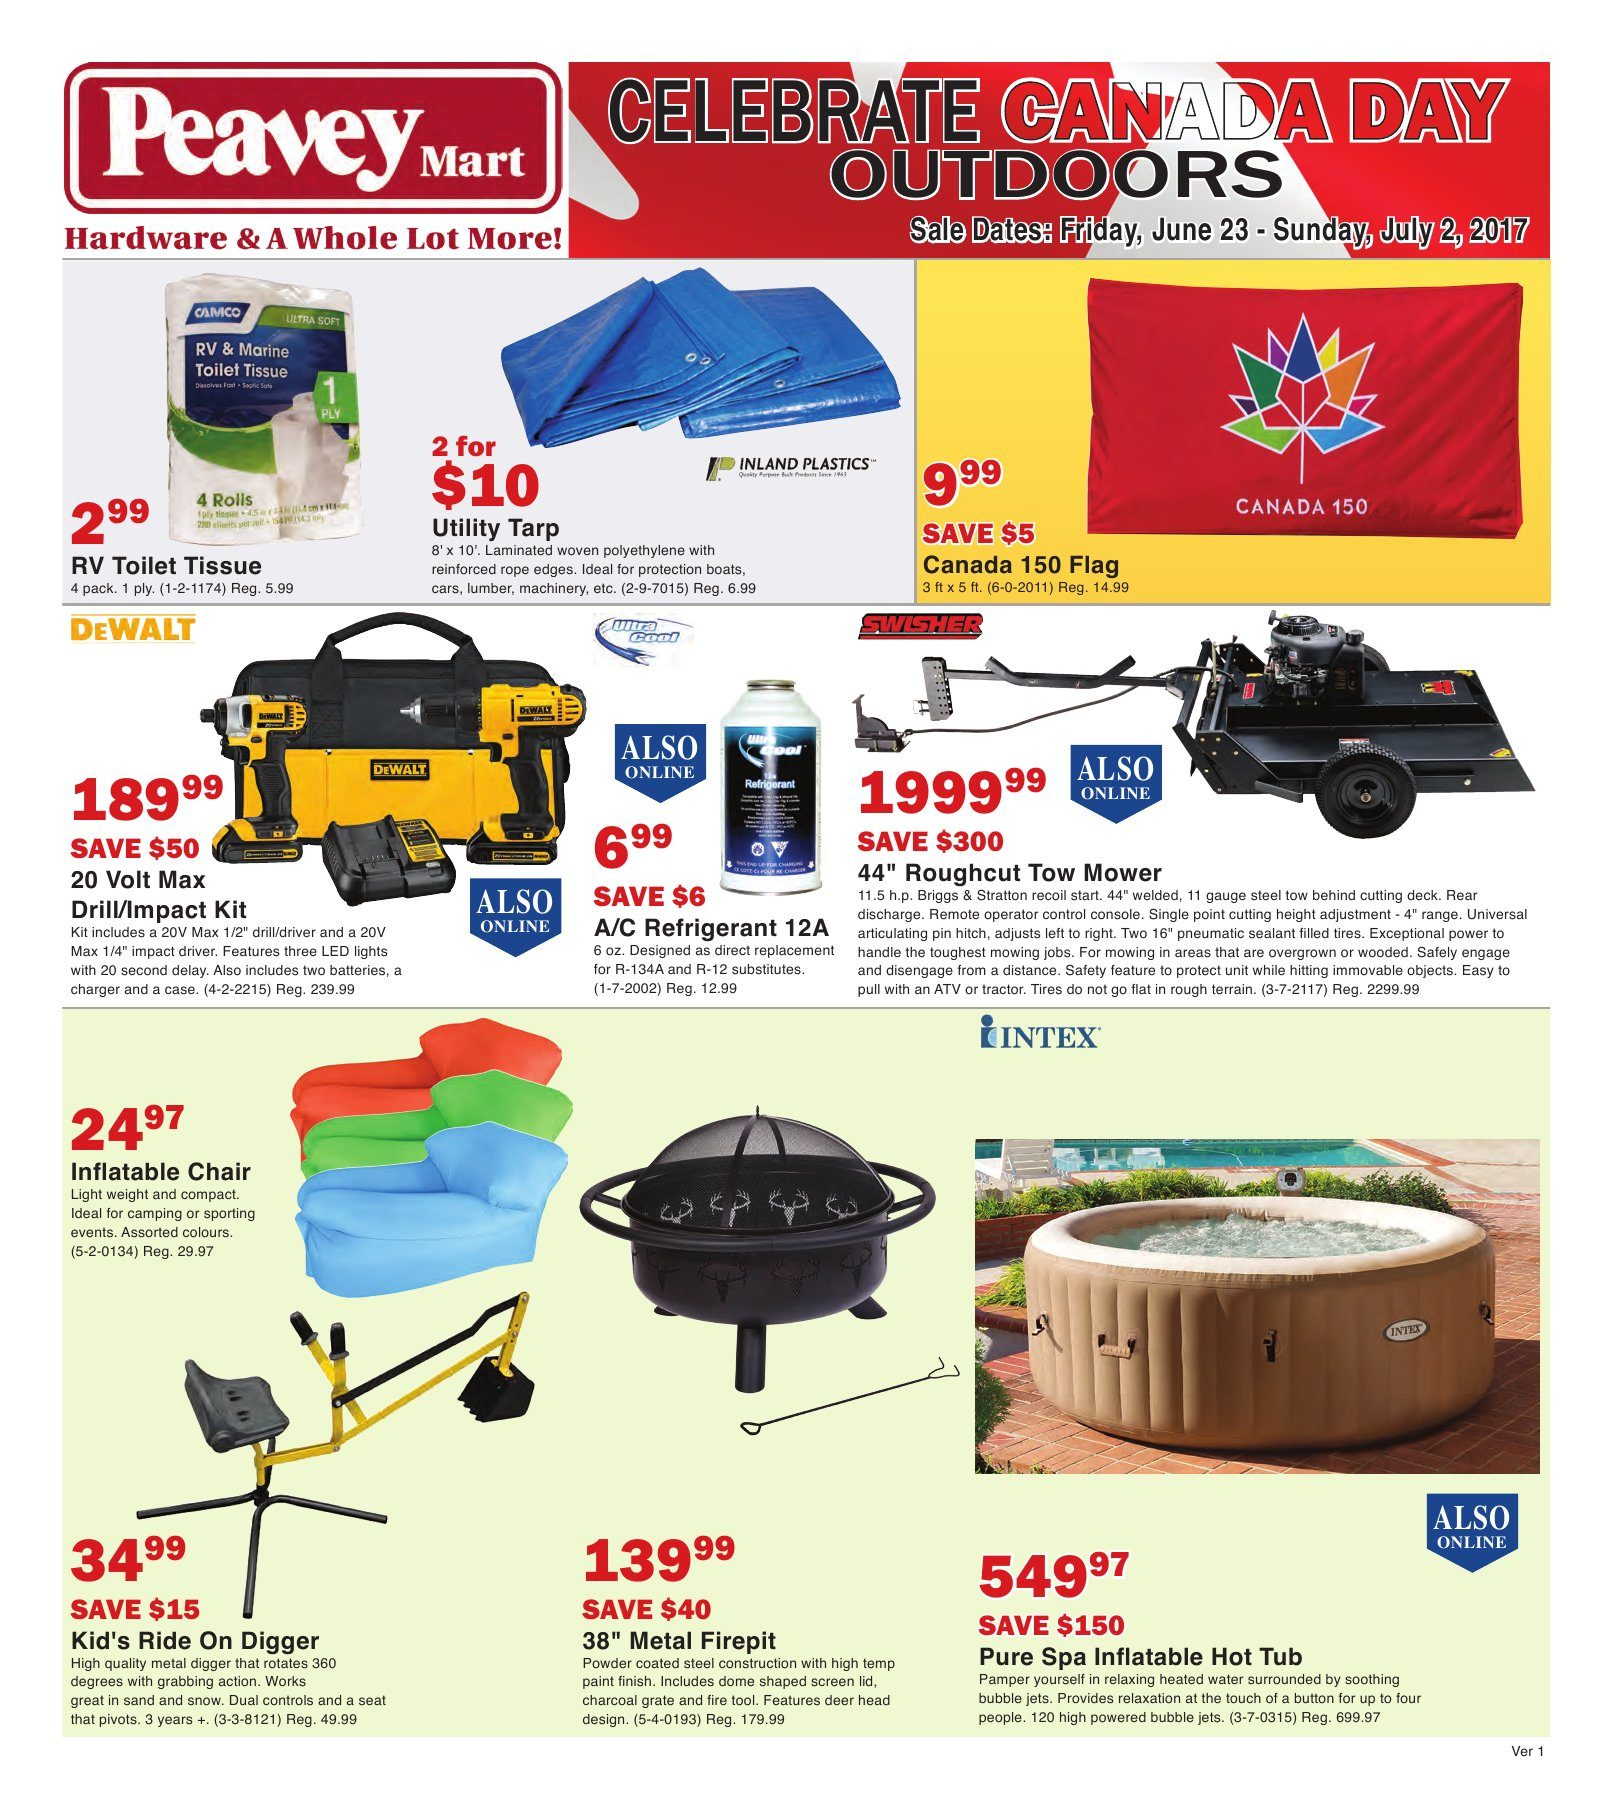 Peaveymart Weekly Flyer Celebrate Canada Day Outdoors Jun 23 Jul 2 Redflagdeals Com